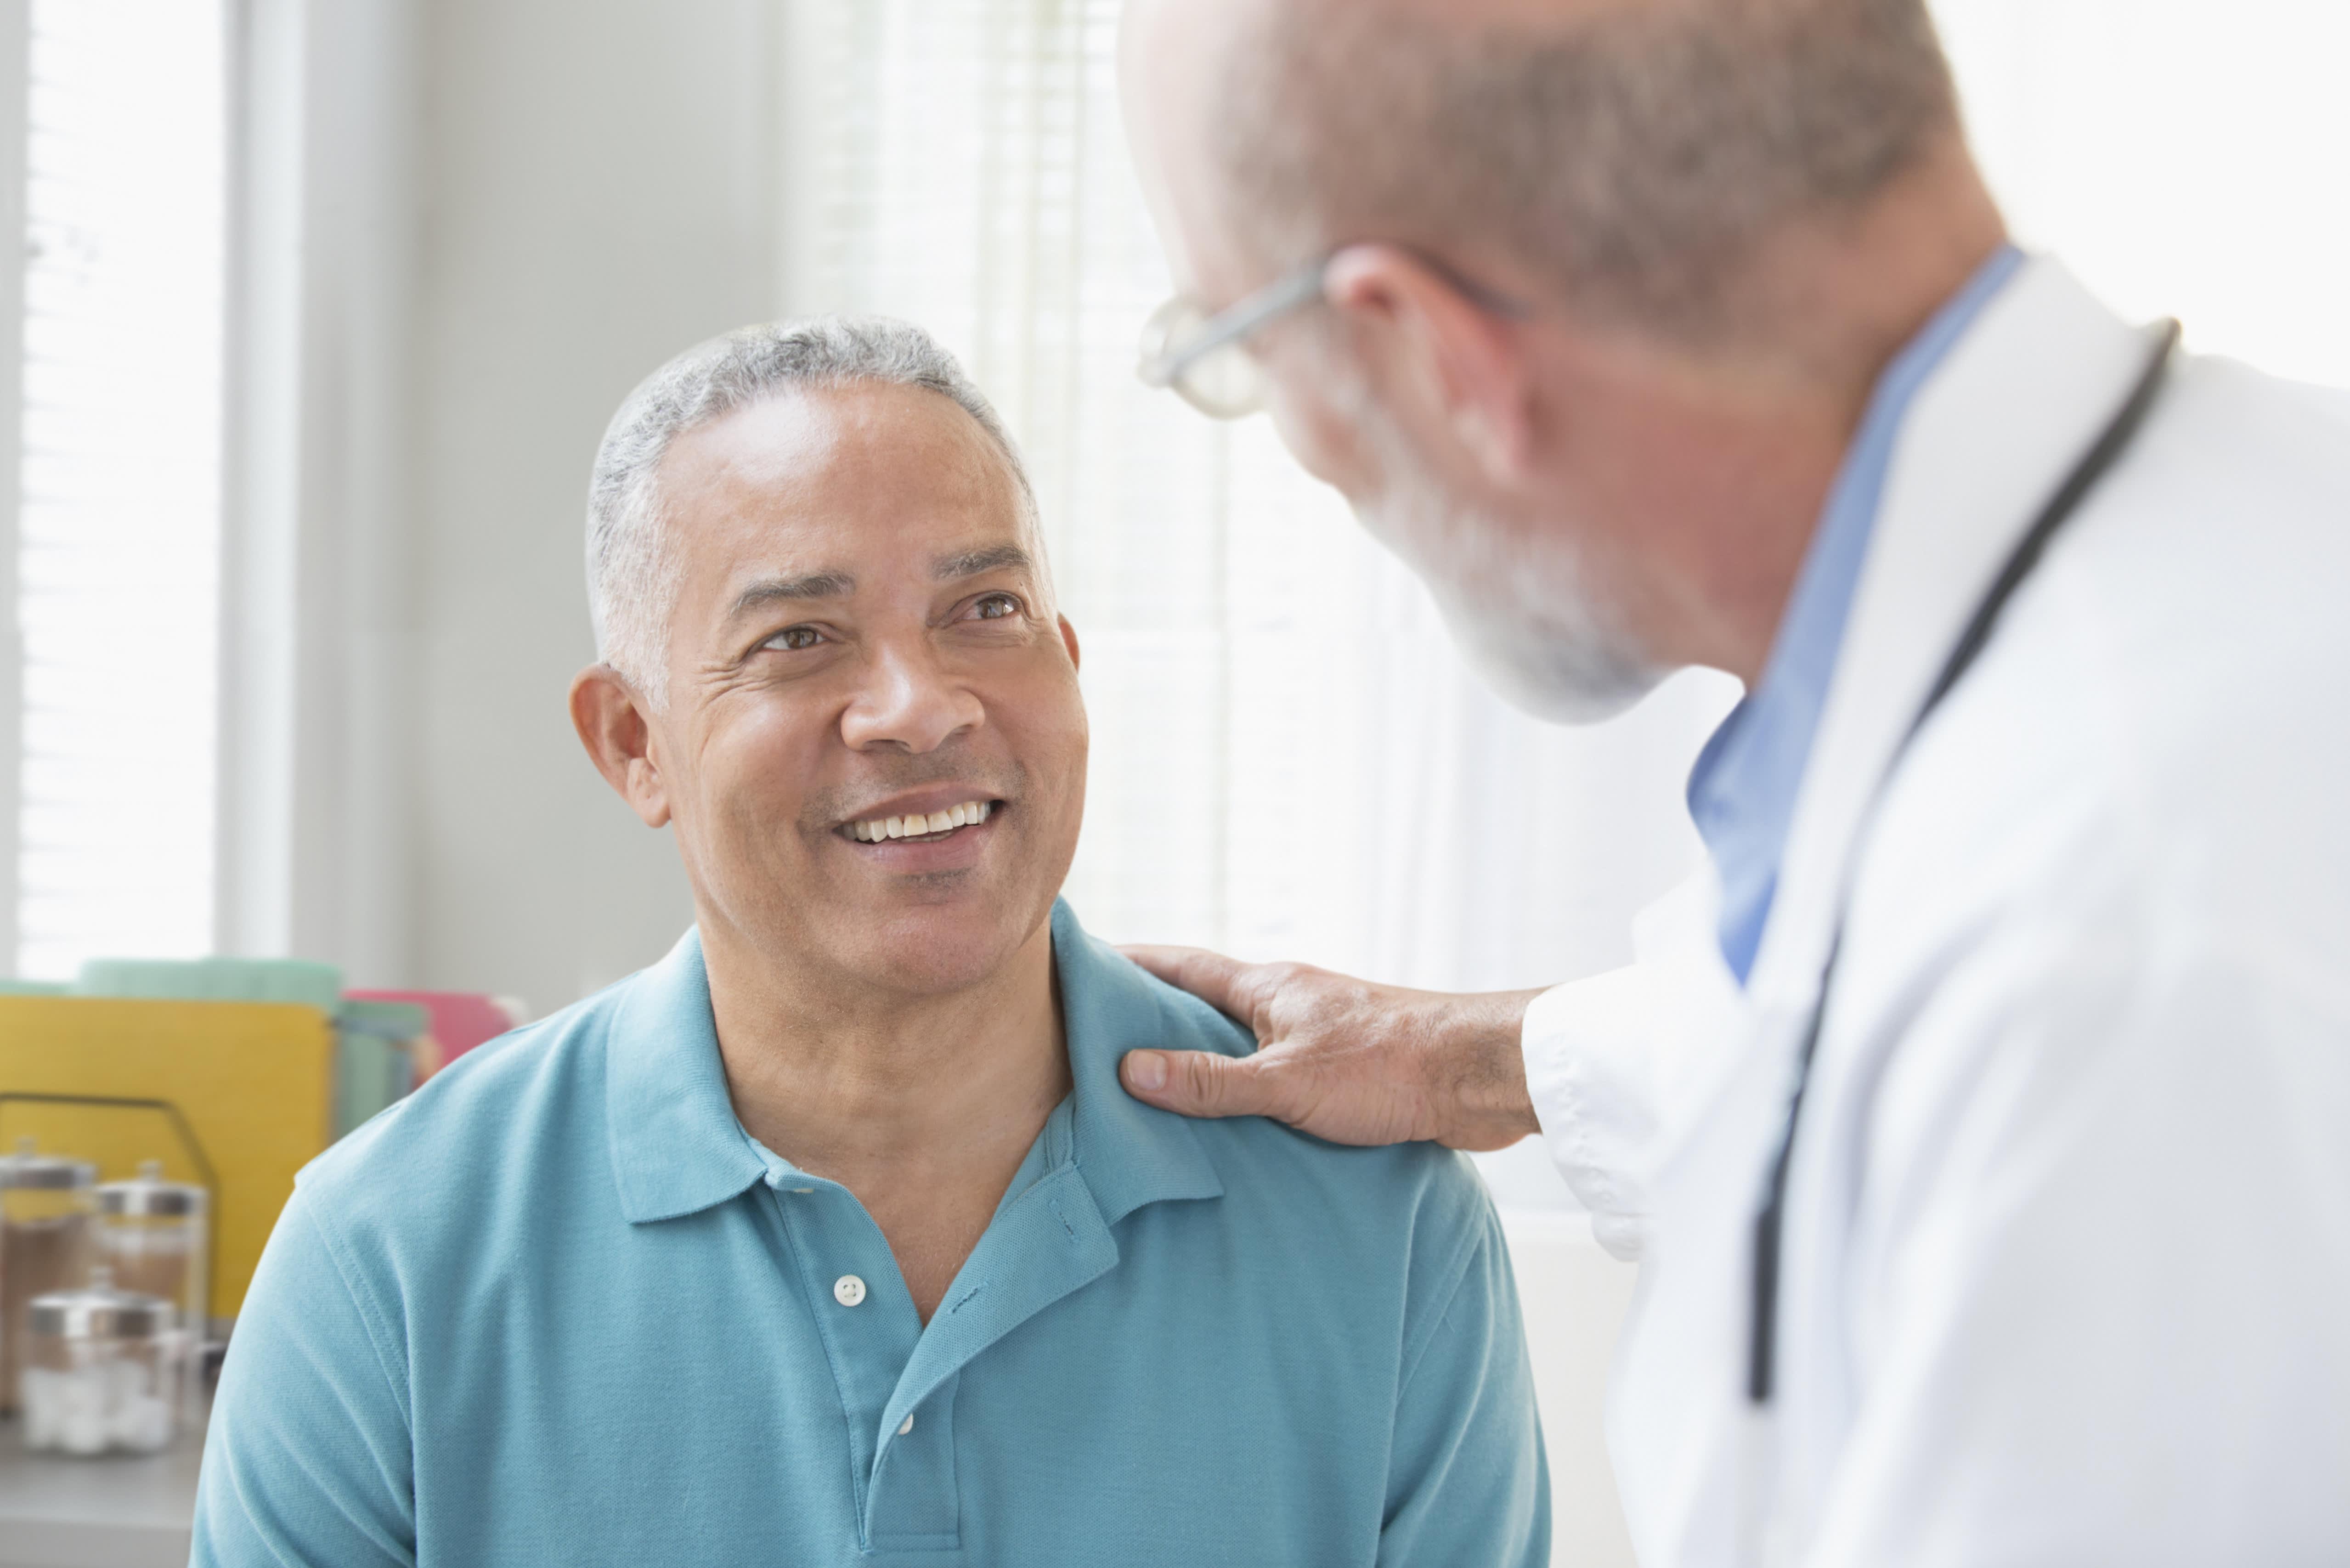 Colonoscopy prep may be easier with new FDA approved drug Plenvu